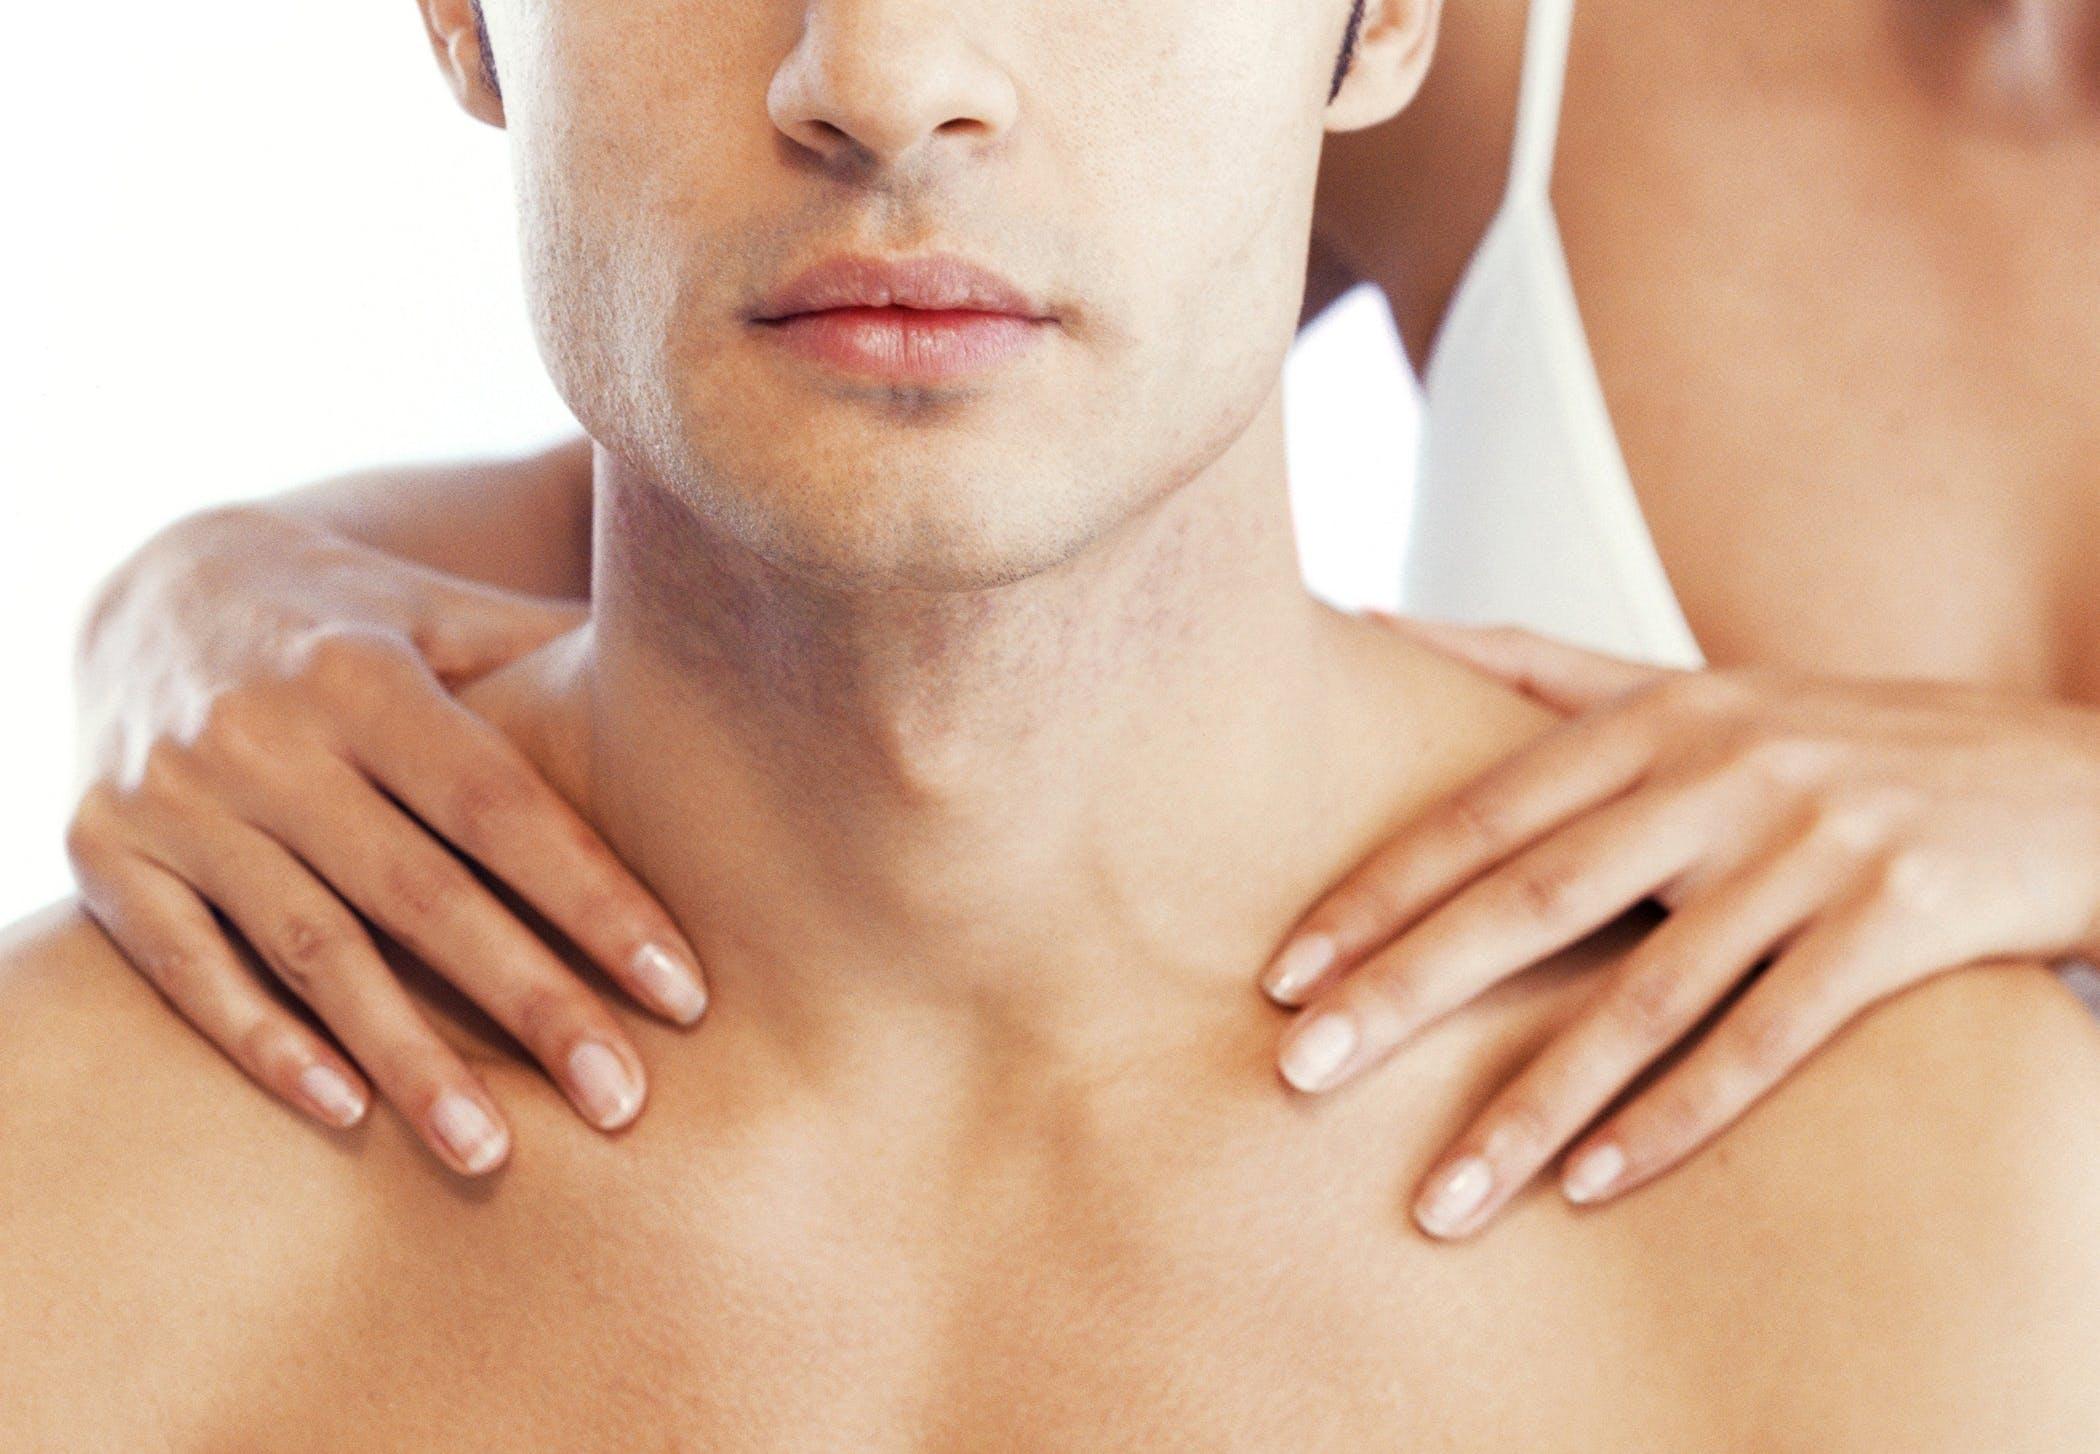 thai massage sex sensuell massage